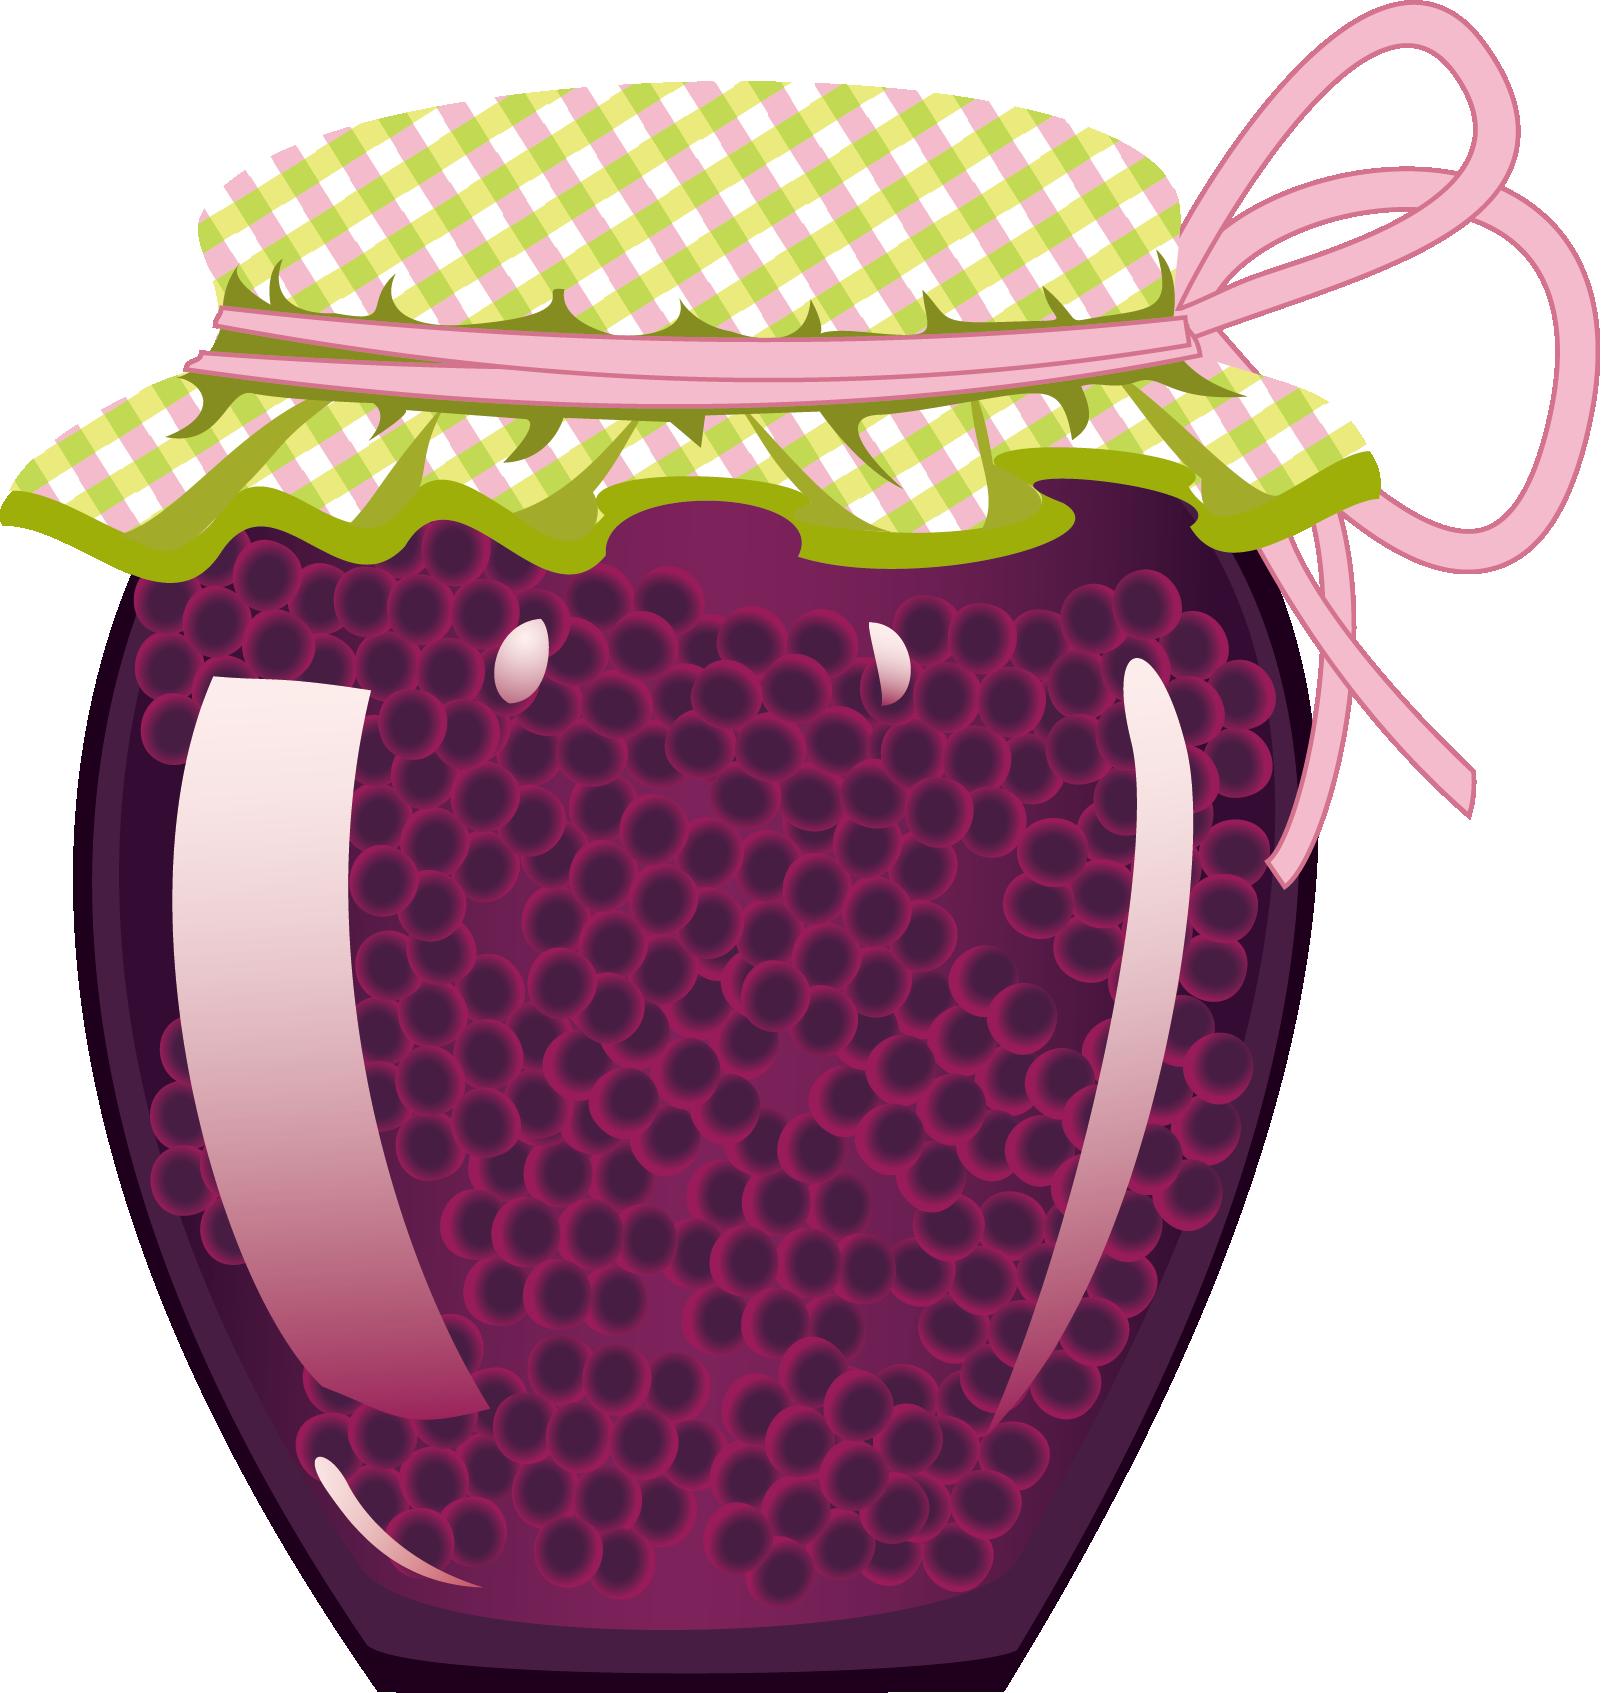 Jam clipart raspberry jam. Marmalade fruit preserves jar